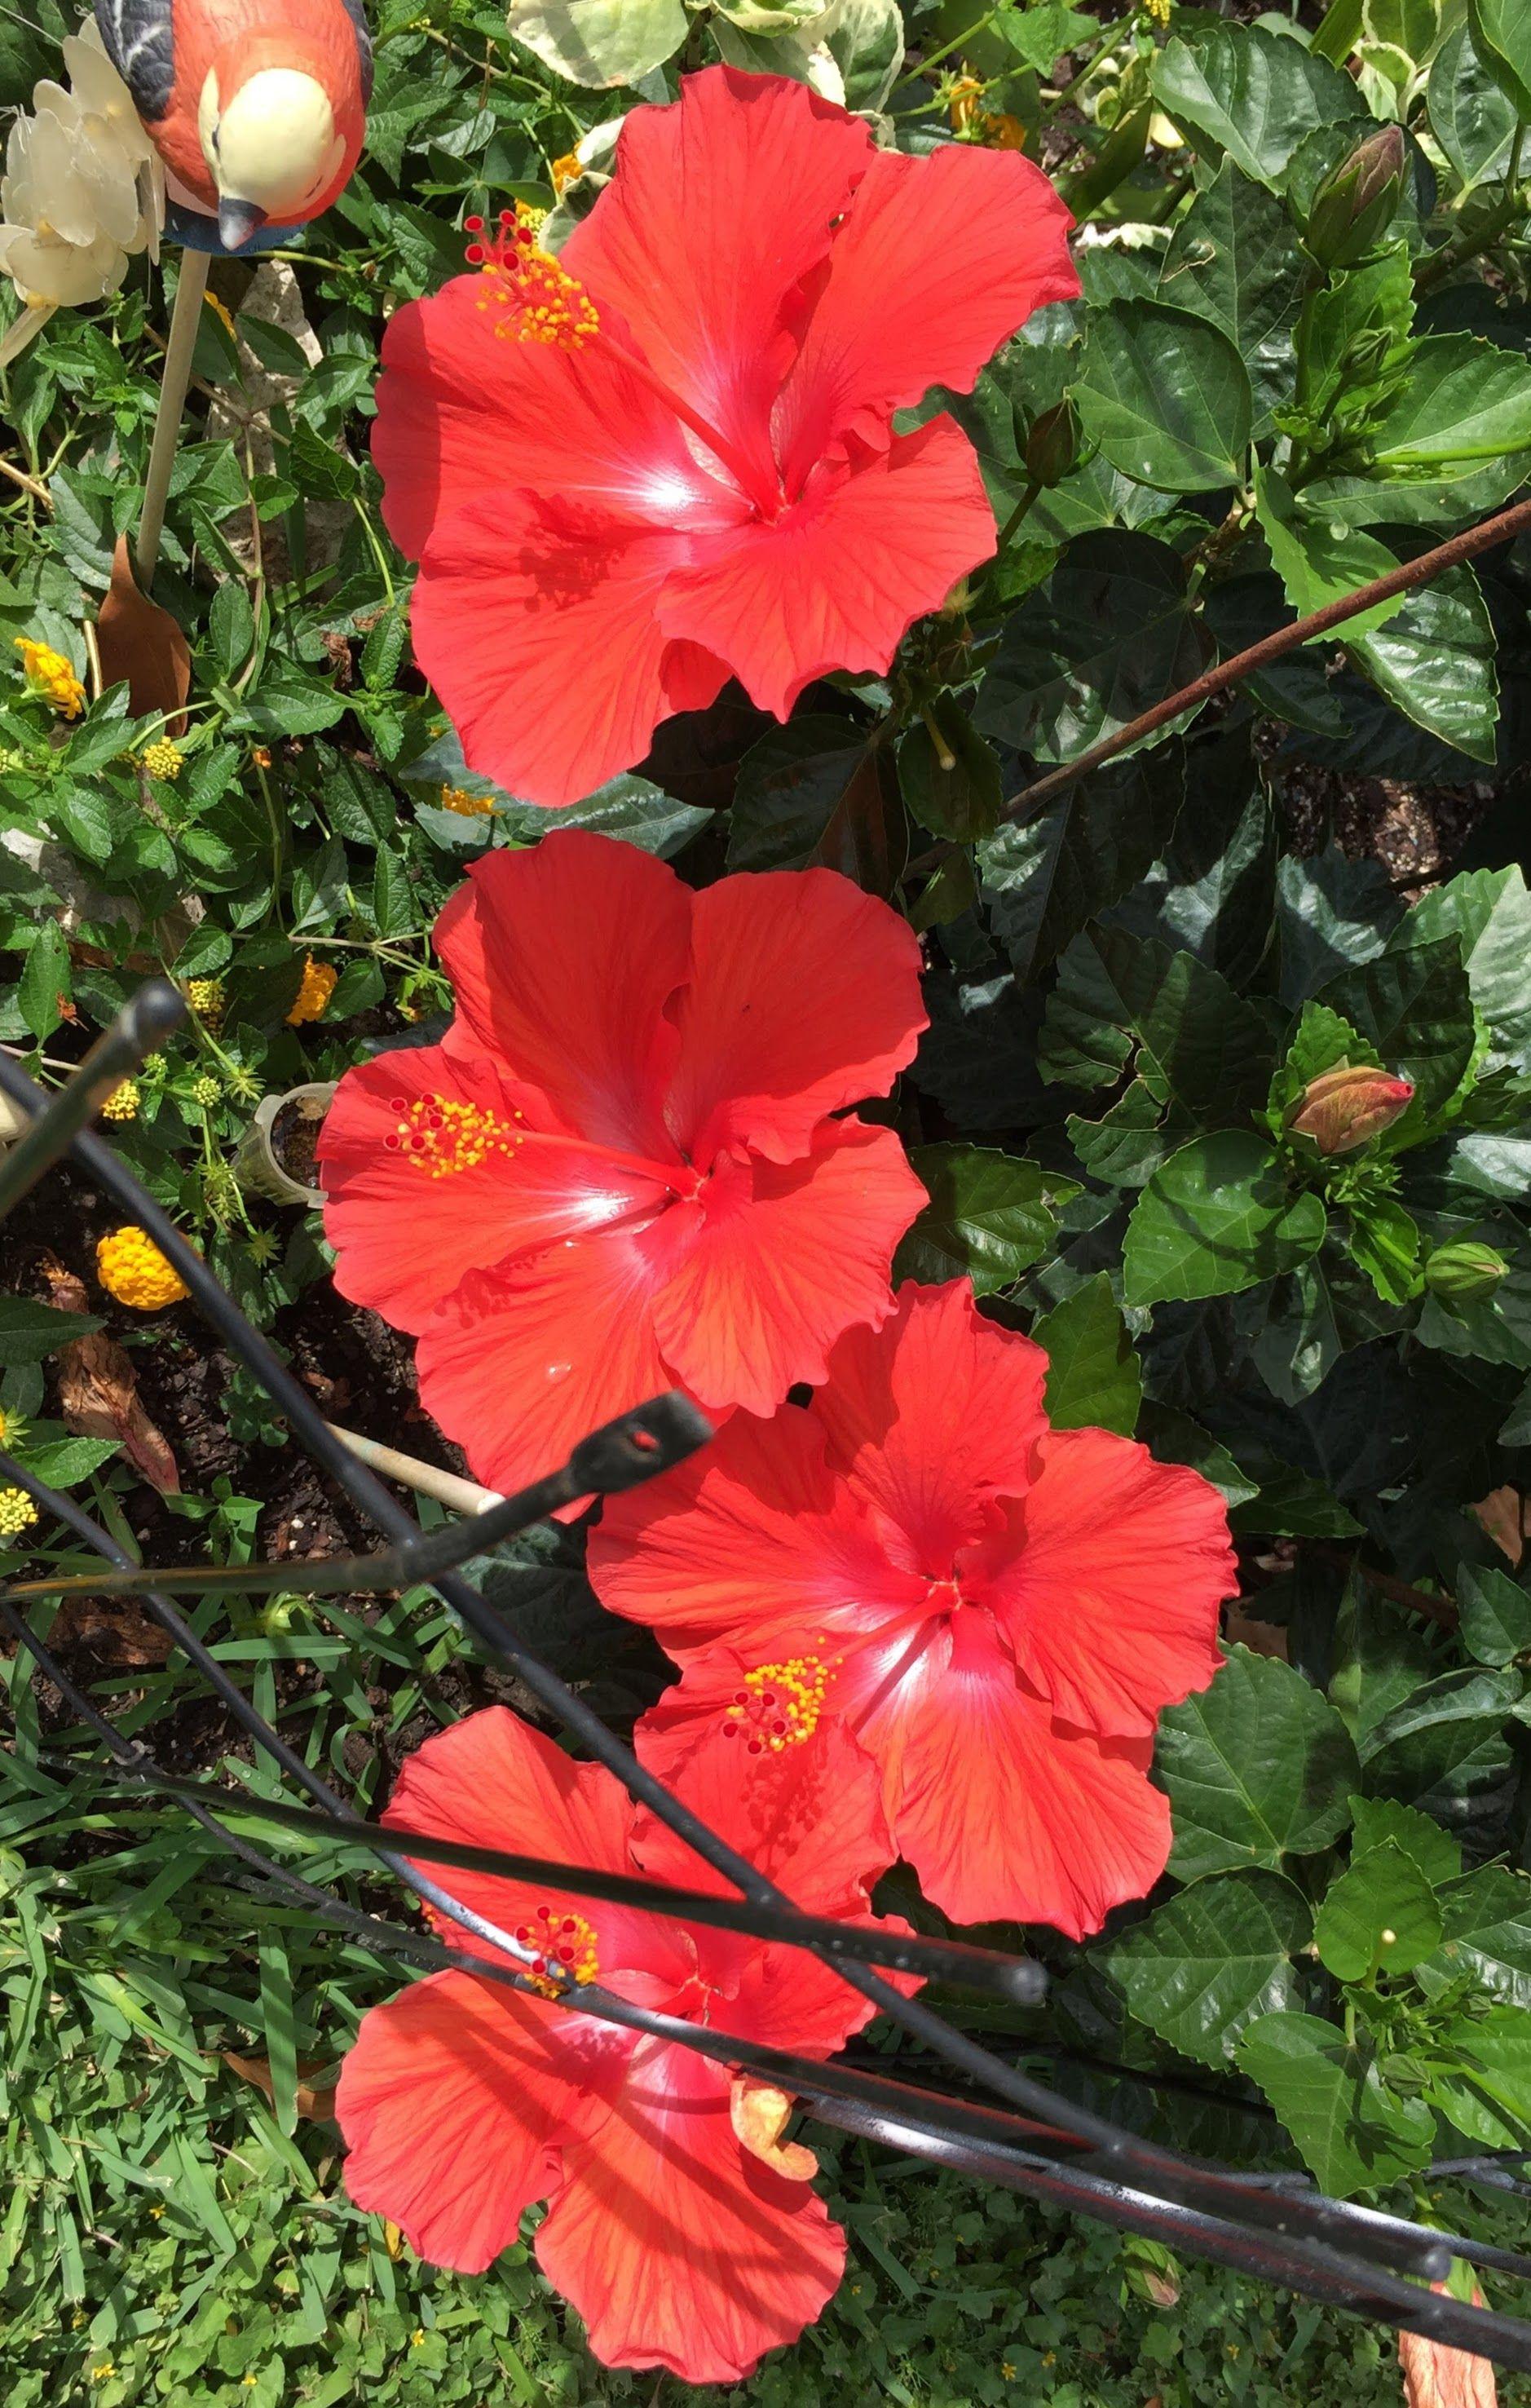 Pin by elena reyes m on flowers plants pinterest hibiscus pin by elena reyes m on flowers plants pinterest hibiscus beautiful flowers and plants izmirmasajfo